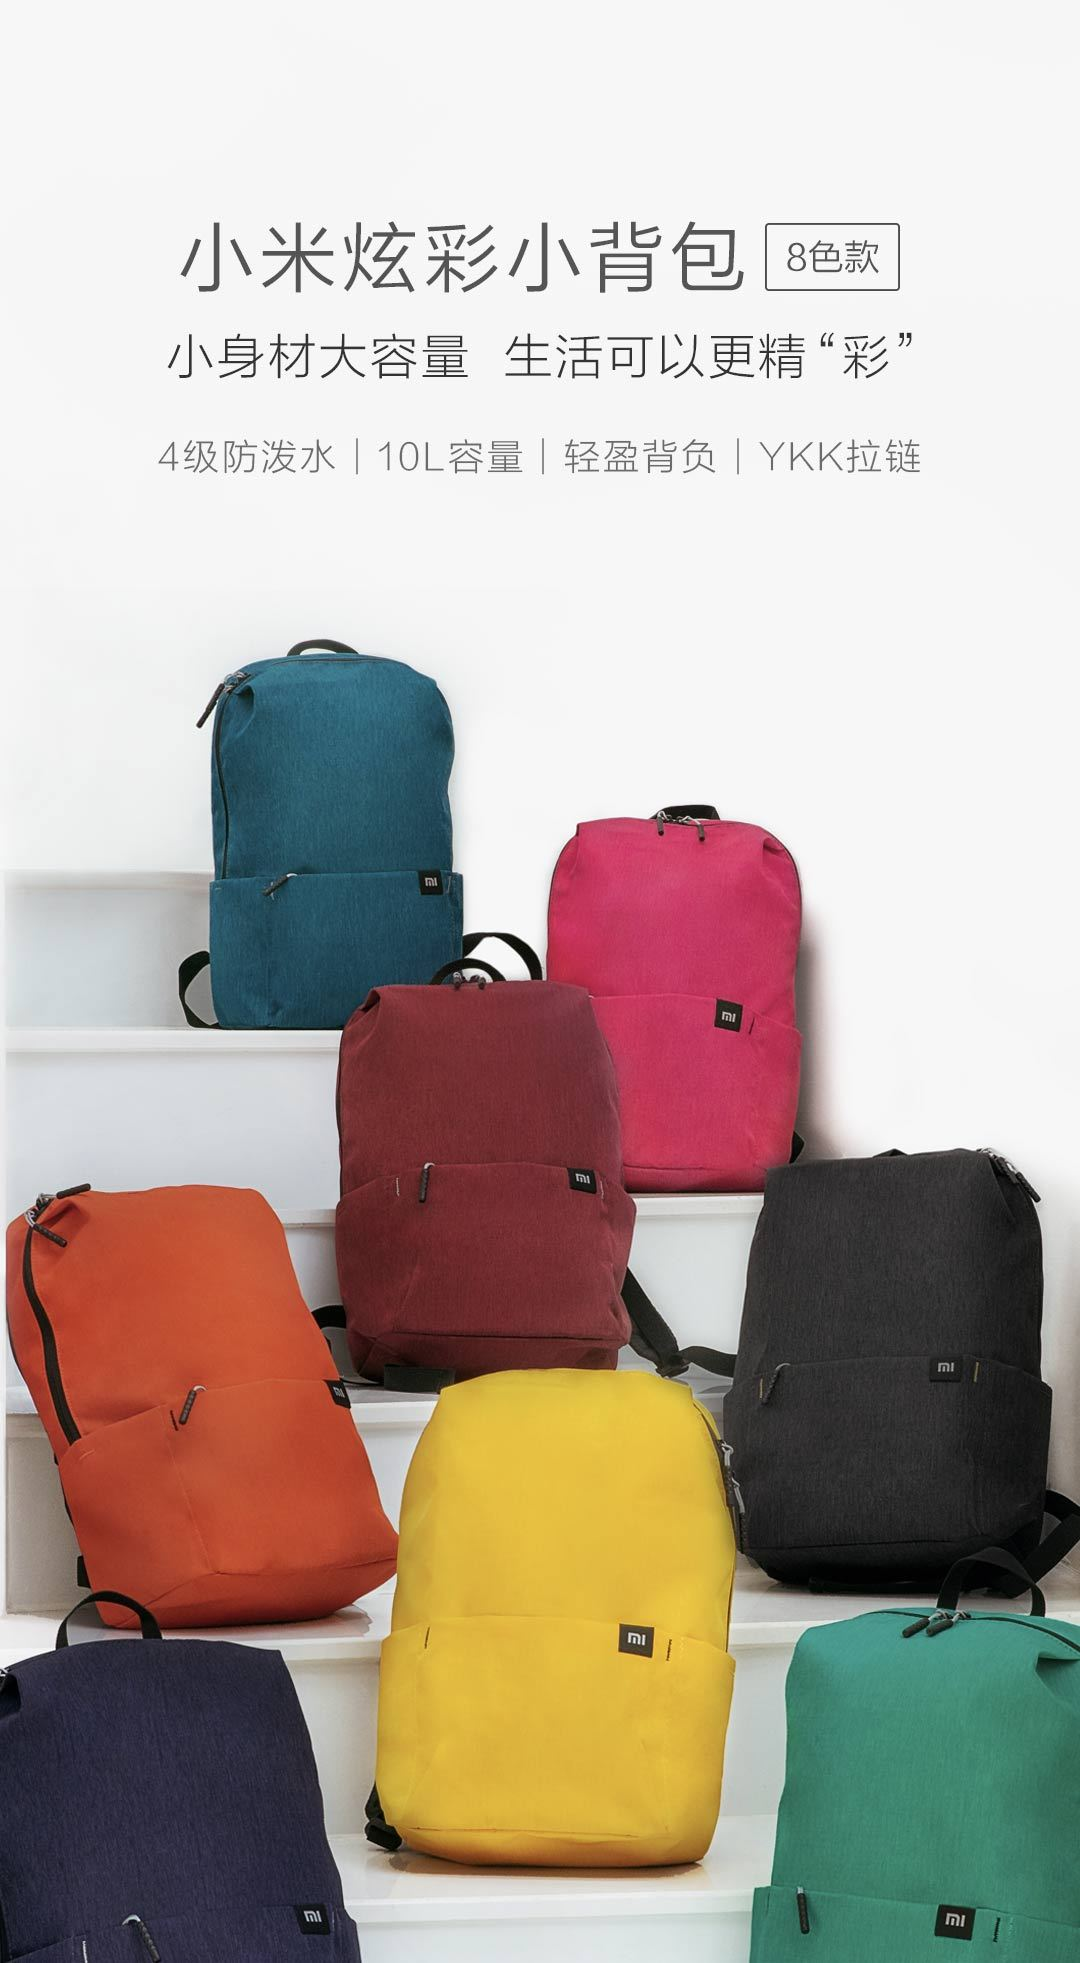 Xiaomi-Mi-Compact-Backpack-00016